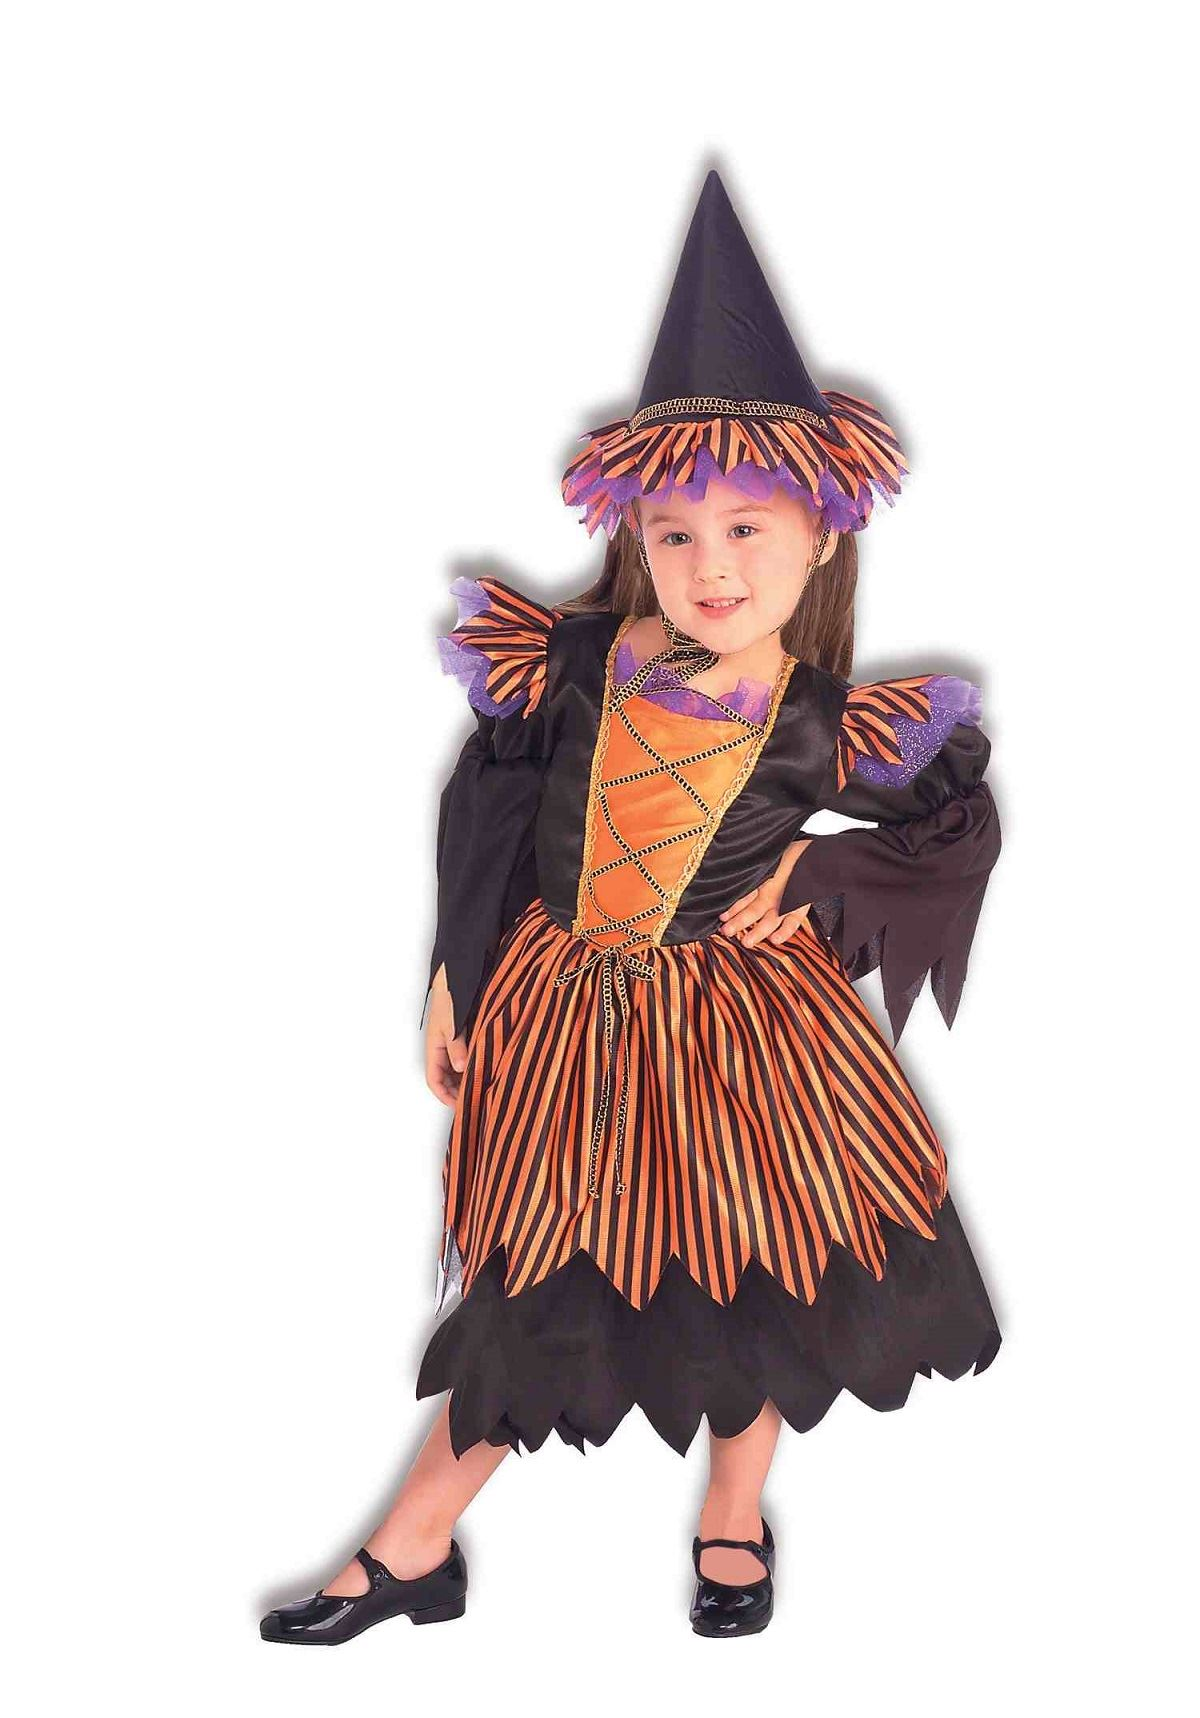 Girls Witch And Vampire Costumes Halloween Costumes | Buy Girls ...